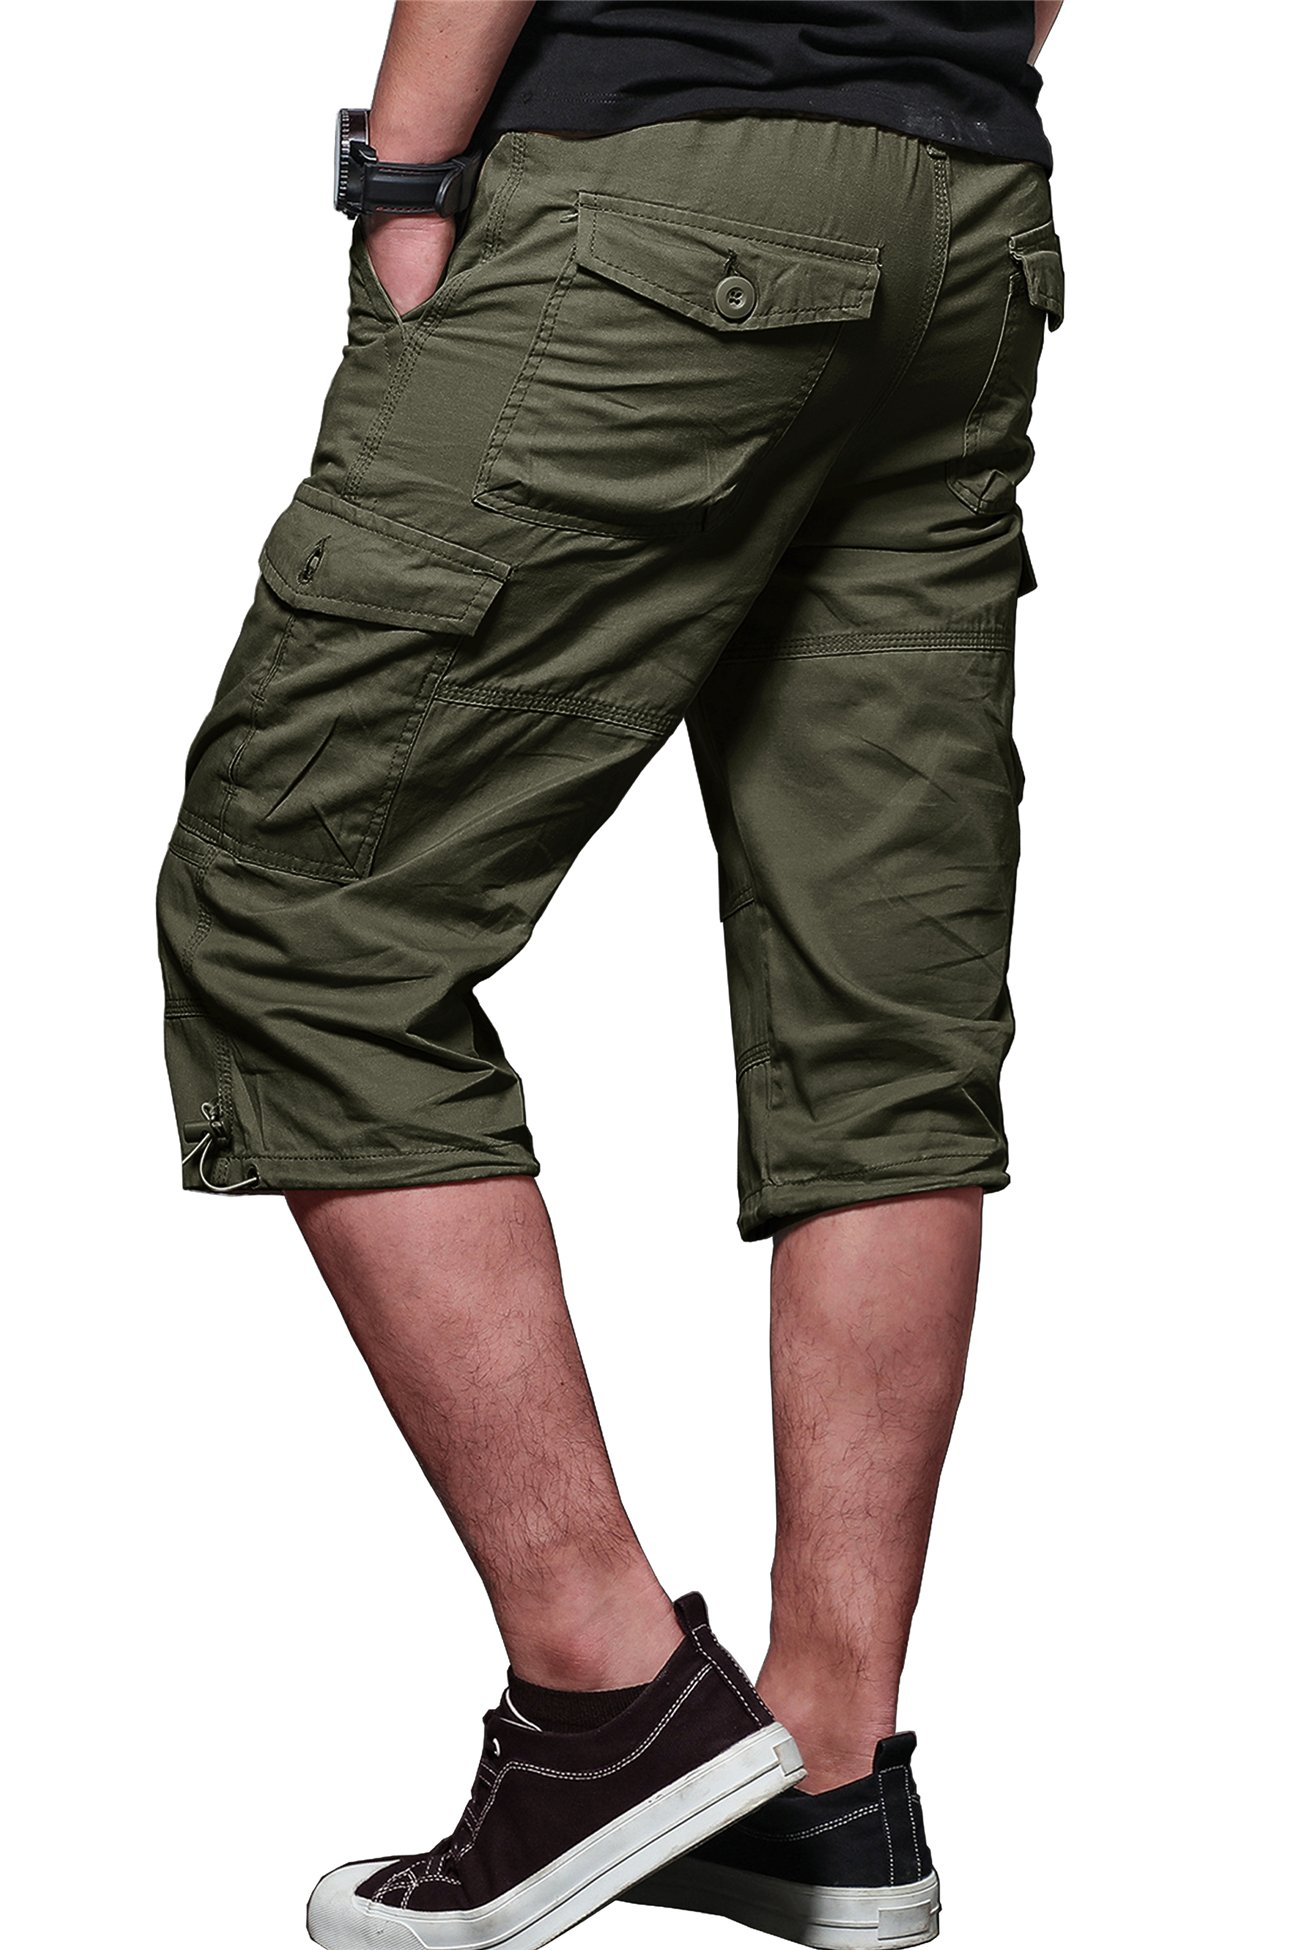 MAKEIIT Men's Juniors Cargo Shorts XXXL Cargo Shorts Dri Fit Cargo Shorts with Multi-Pocket by MAKEIIT (Image #3)